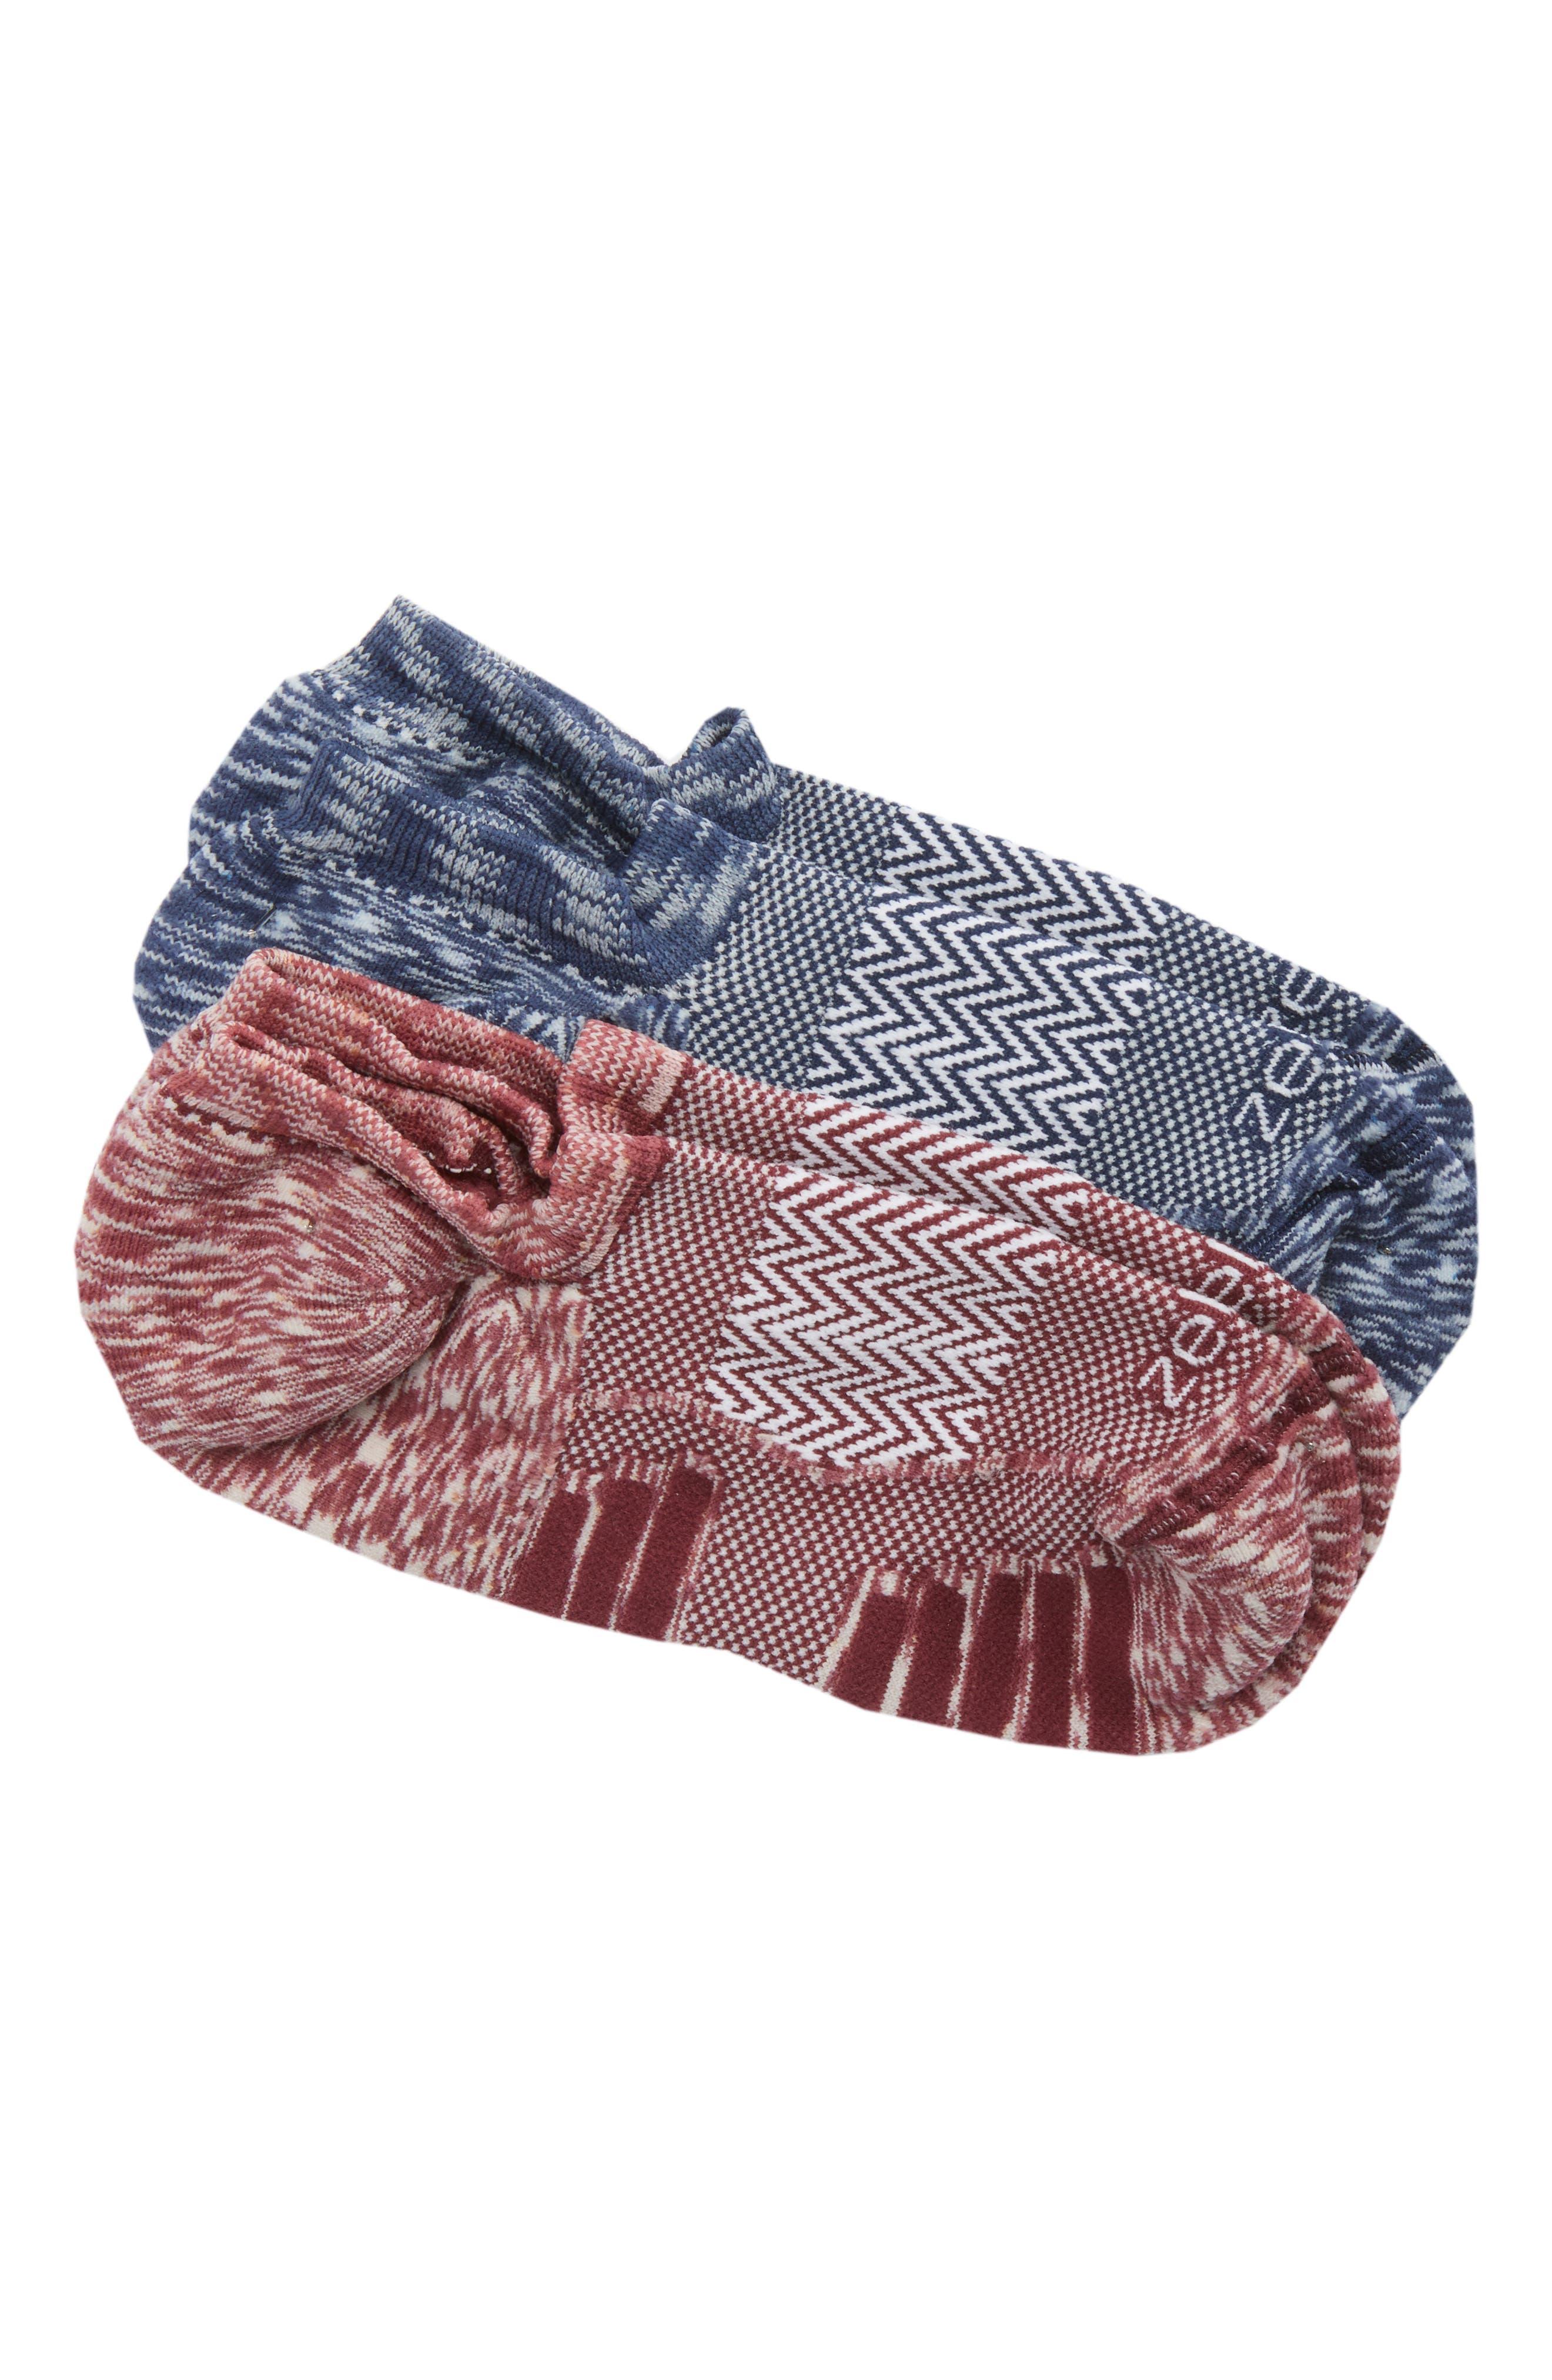 Ultra Light Run 2-Pack Socks,                         Main,                         color, Red Tannin